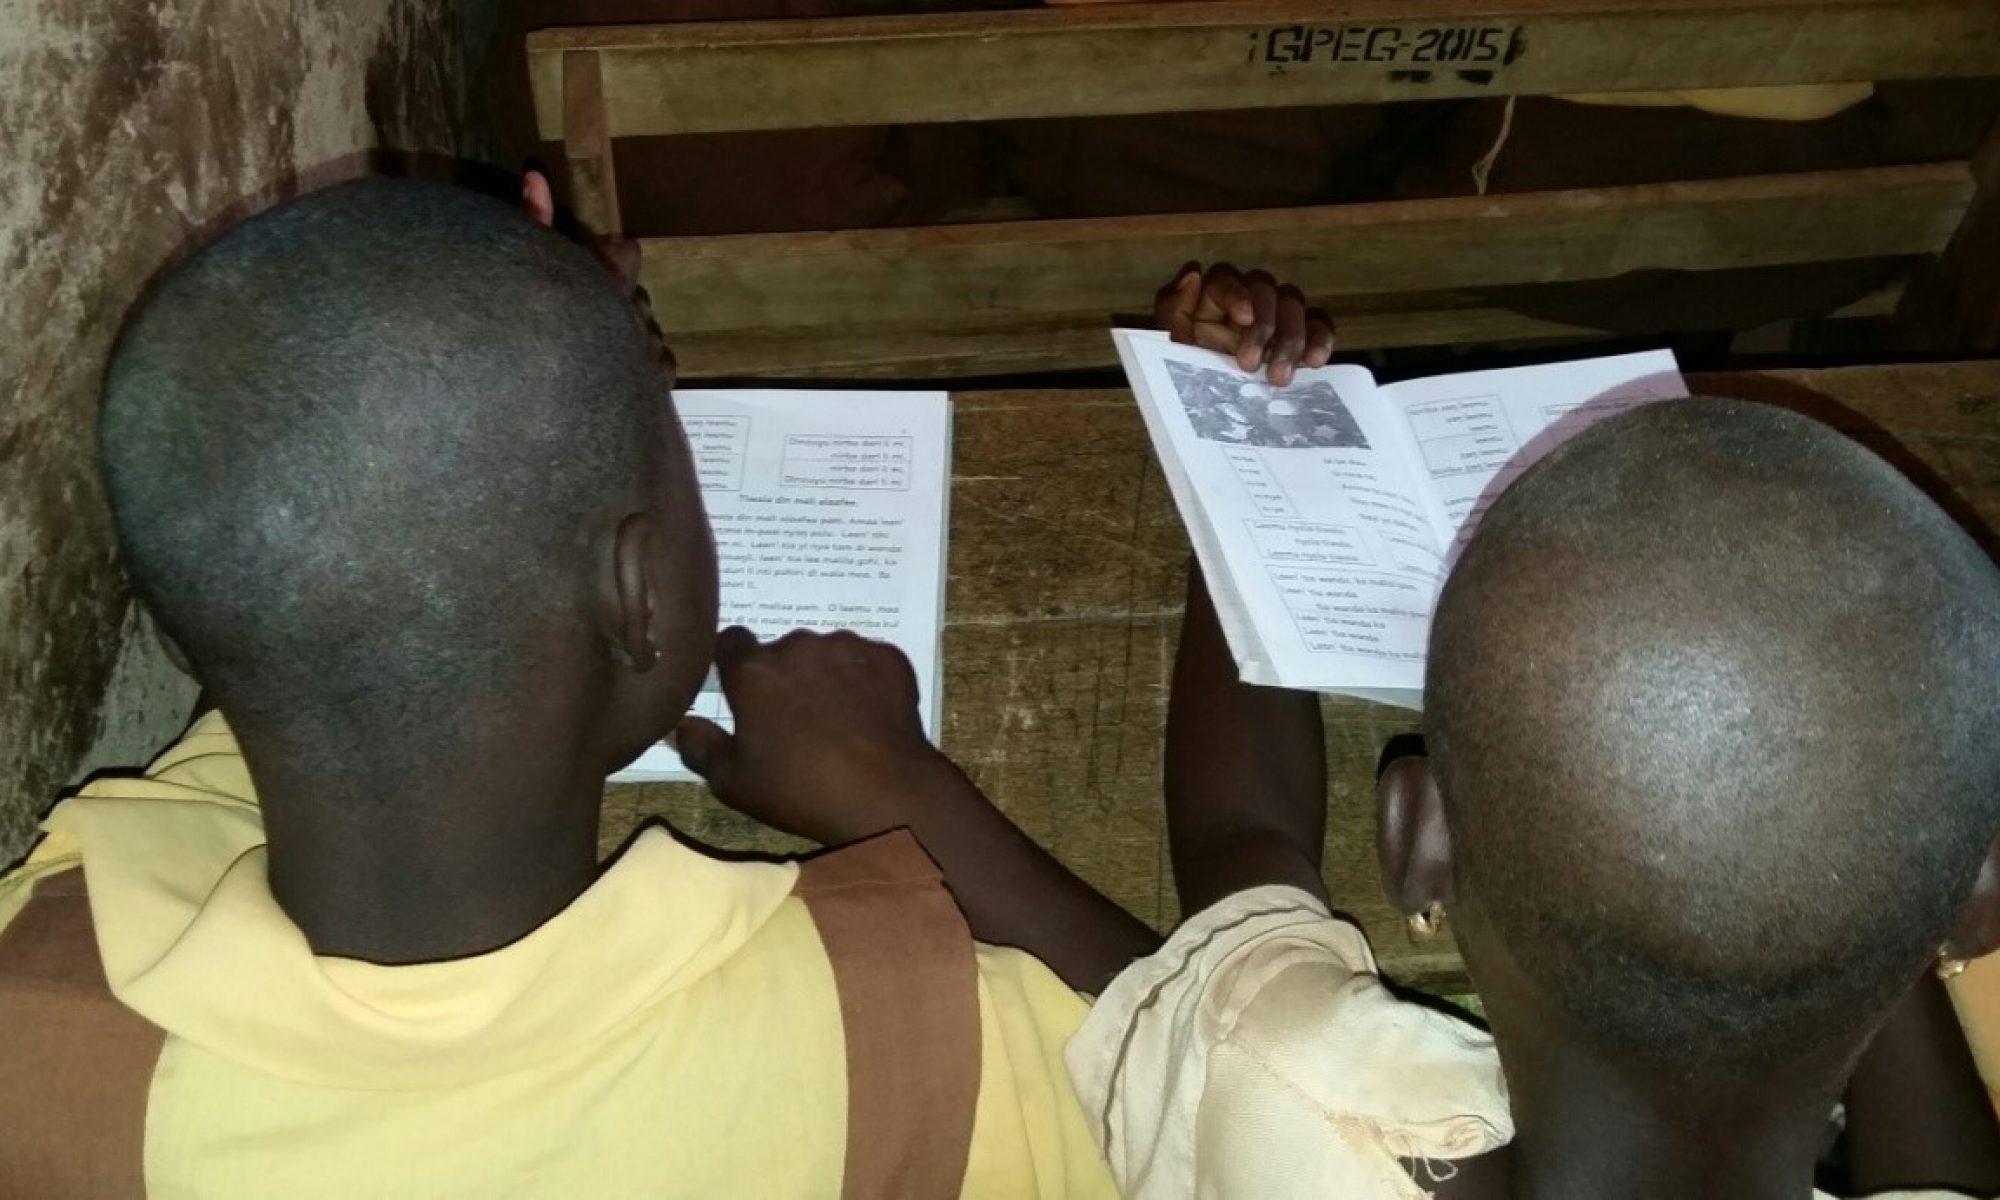 Literacy & Development through Partnership